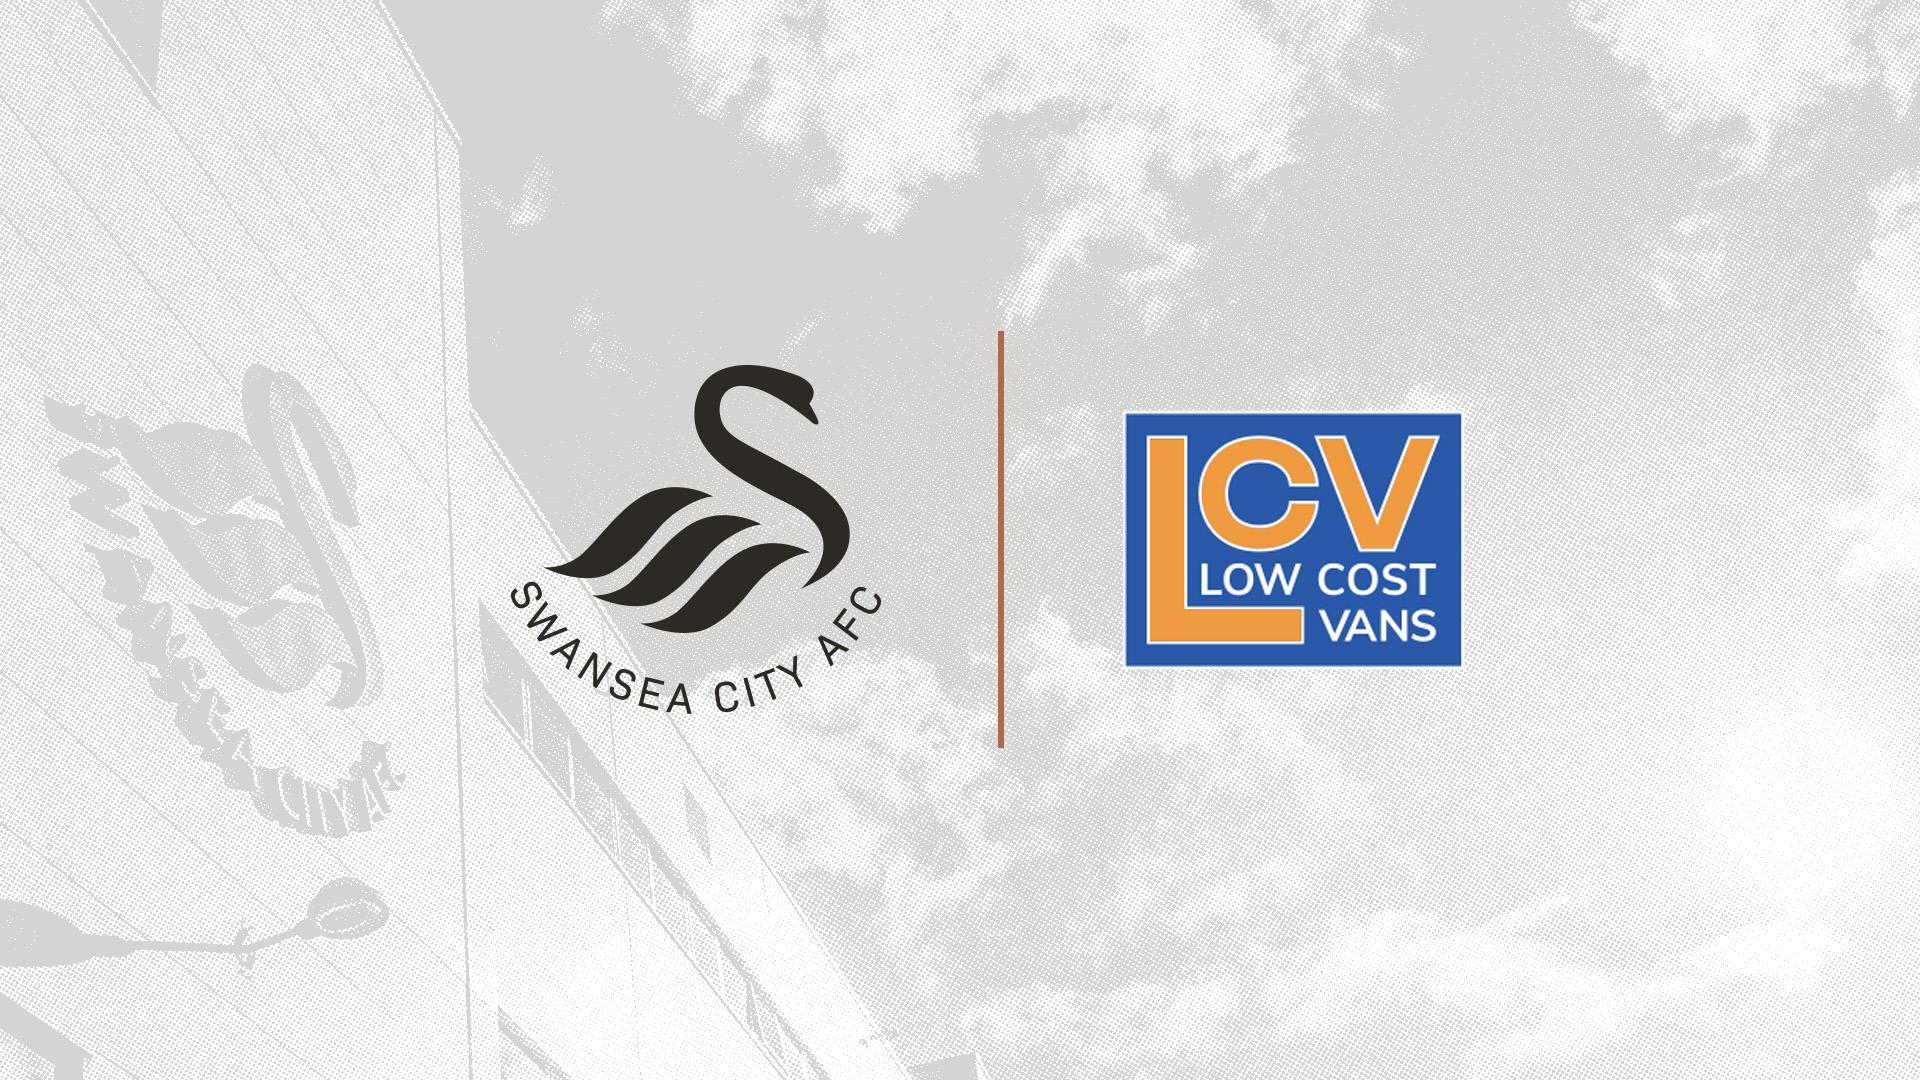 Swans & LCV sponsorship